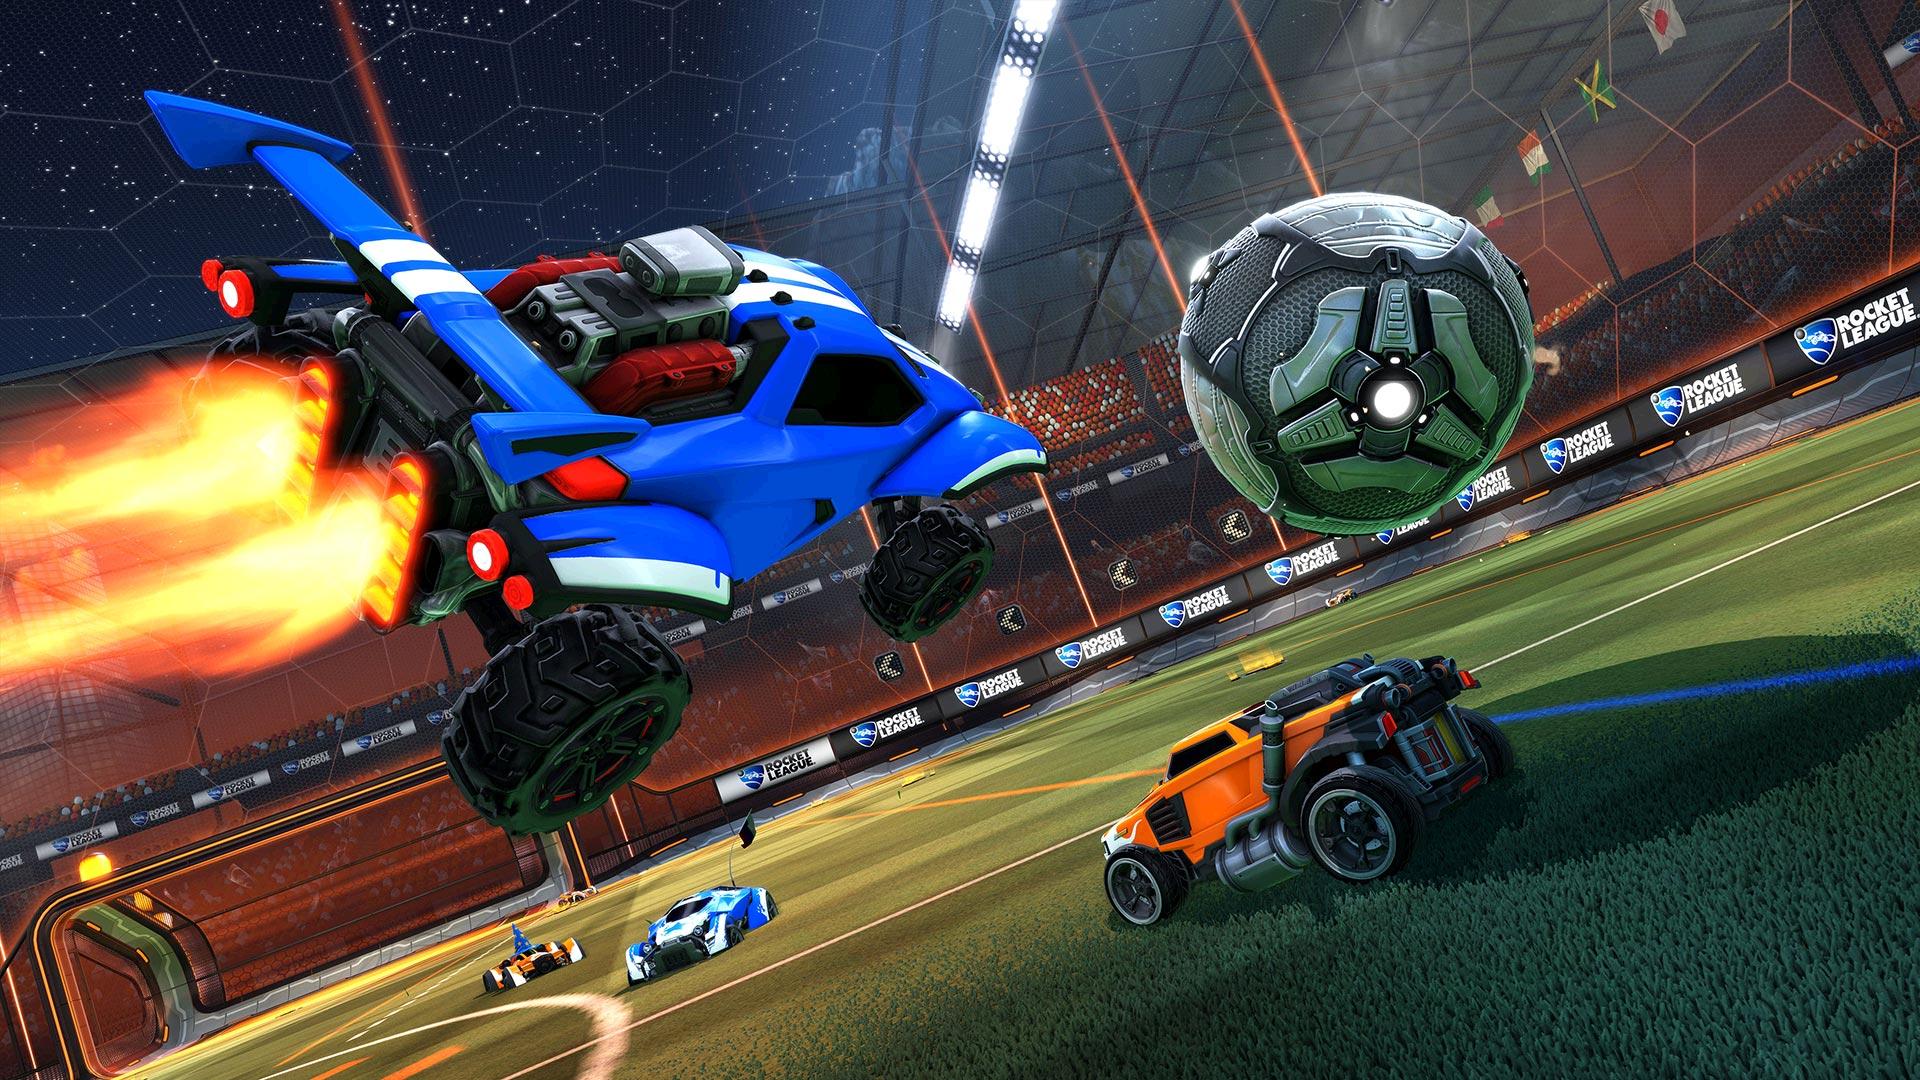 rocket-league-image.jpg